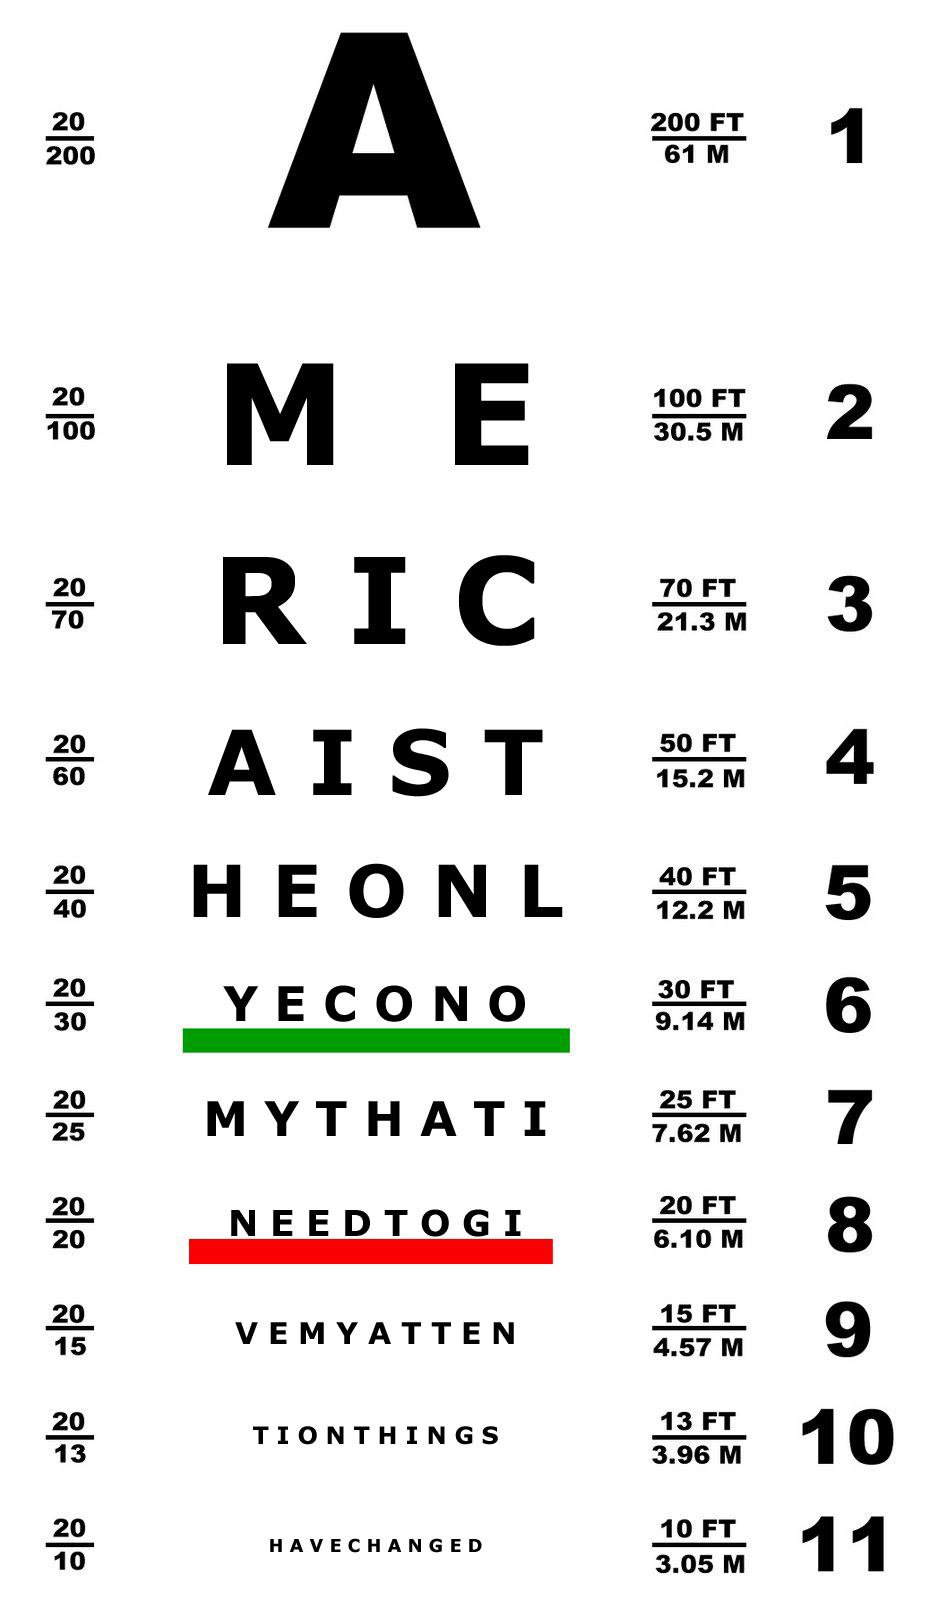 Printable eye test chart uk image collections free any chart examples huge eye chart new2 david gartry huge eye chart new2 huge eye chart new2 nvjuhfo image nvjuhfo Images